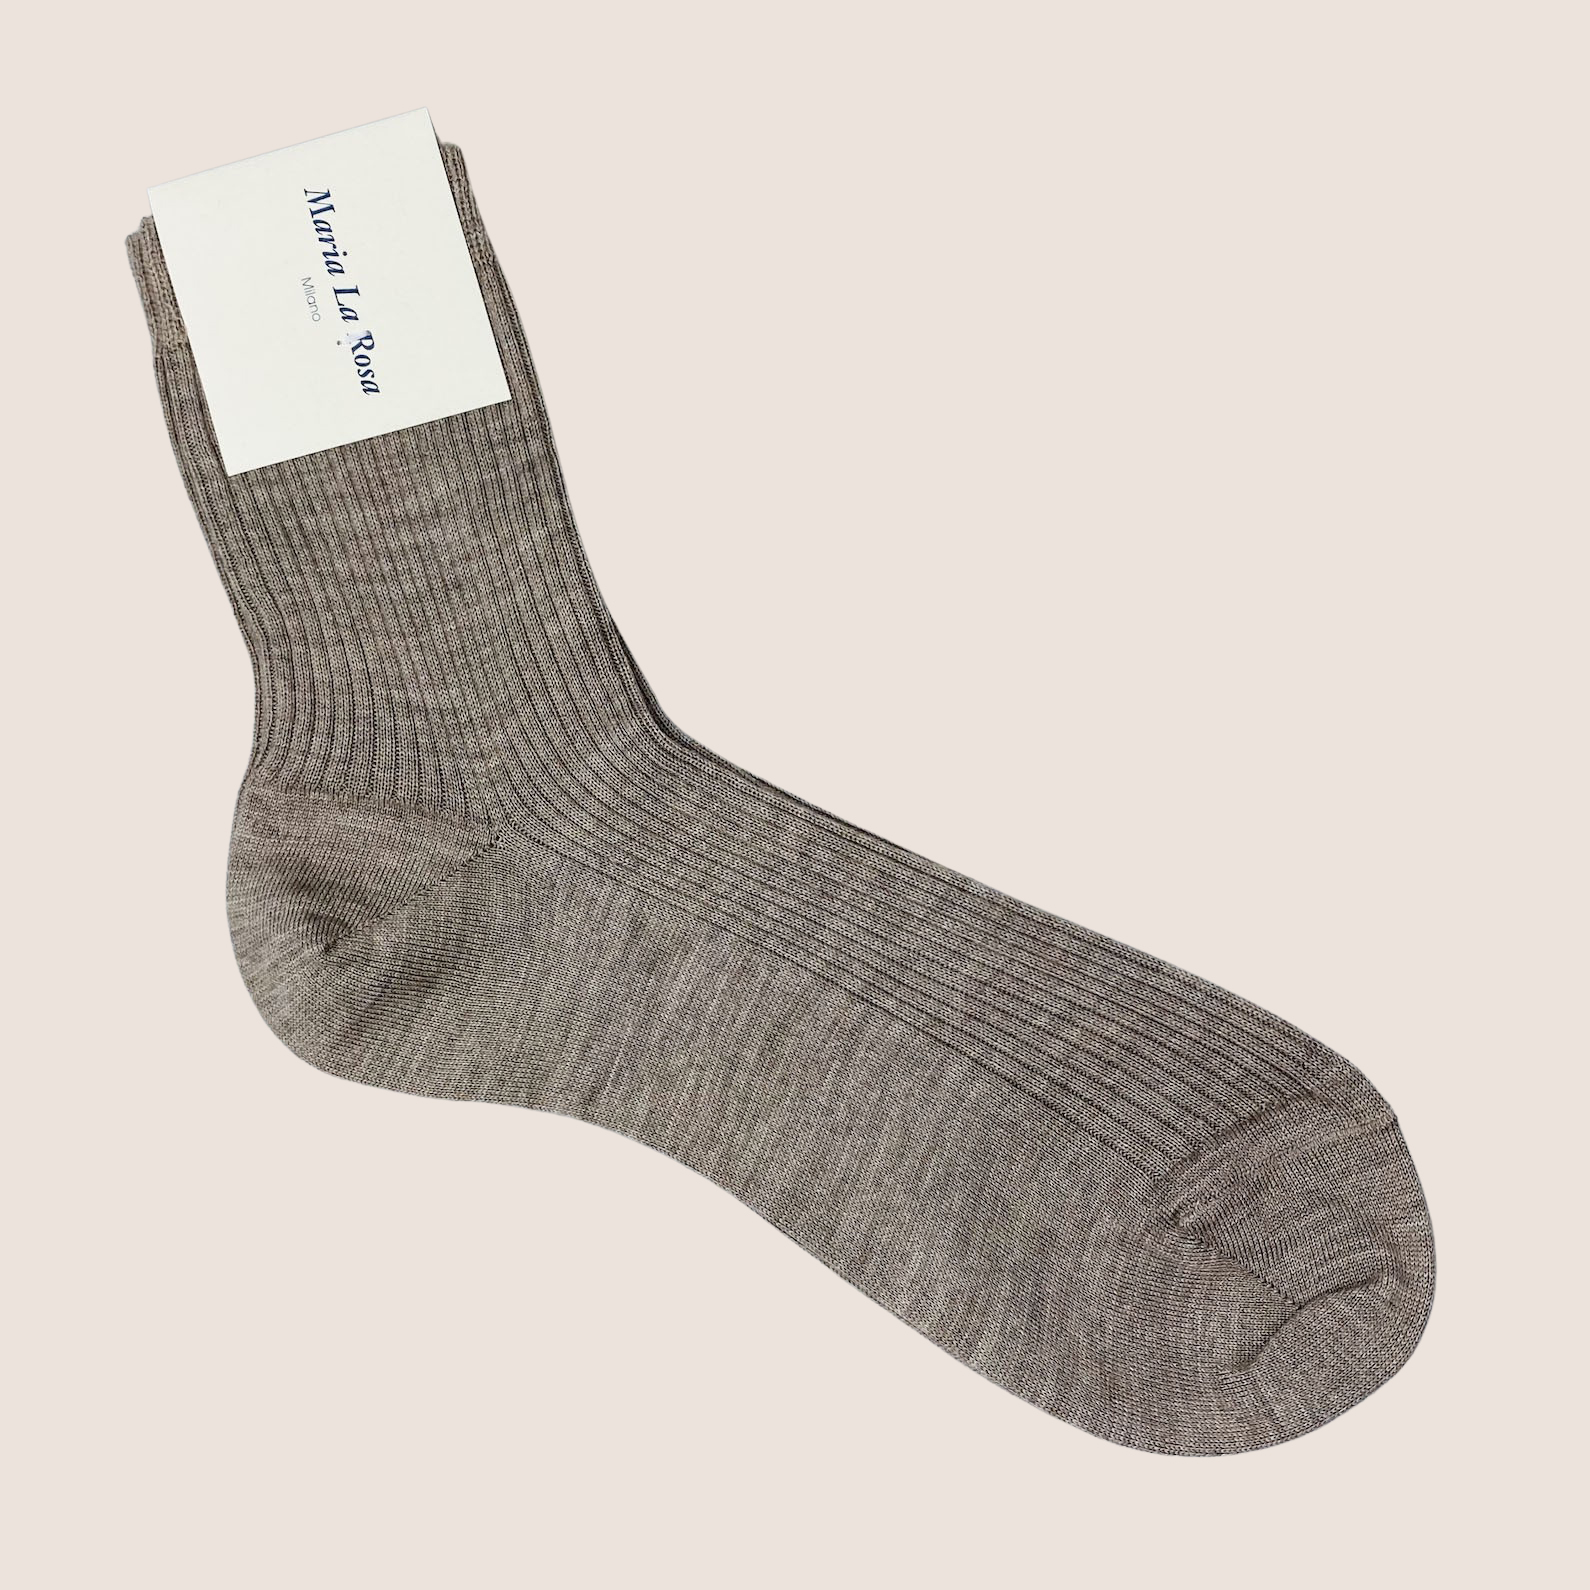 English Ladies Socks